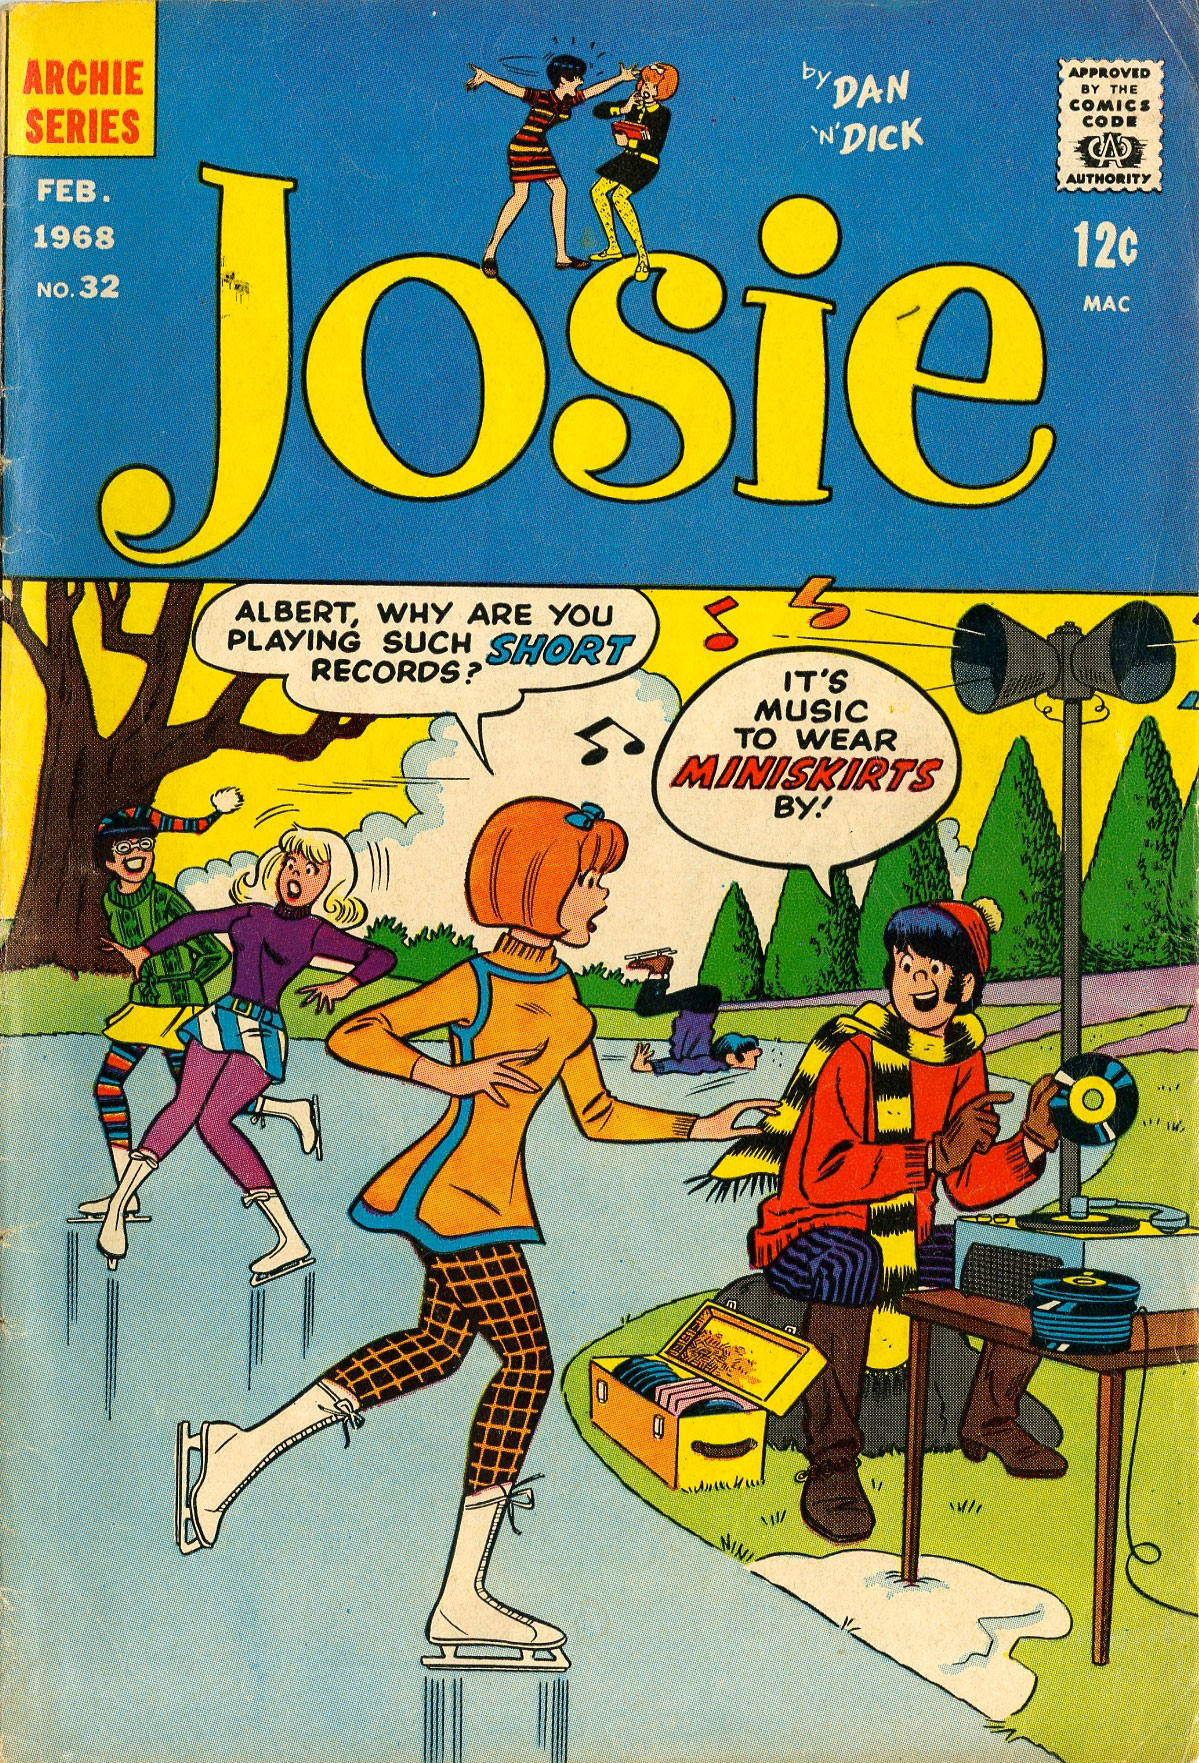 Read online She's Josie comic -  Issue #32 - 1